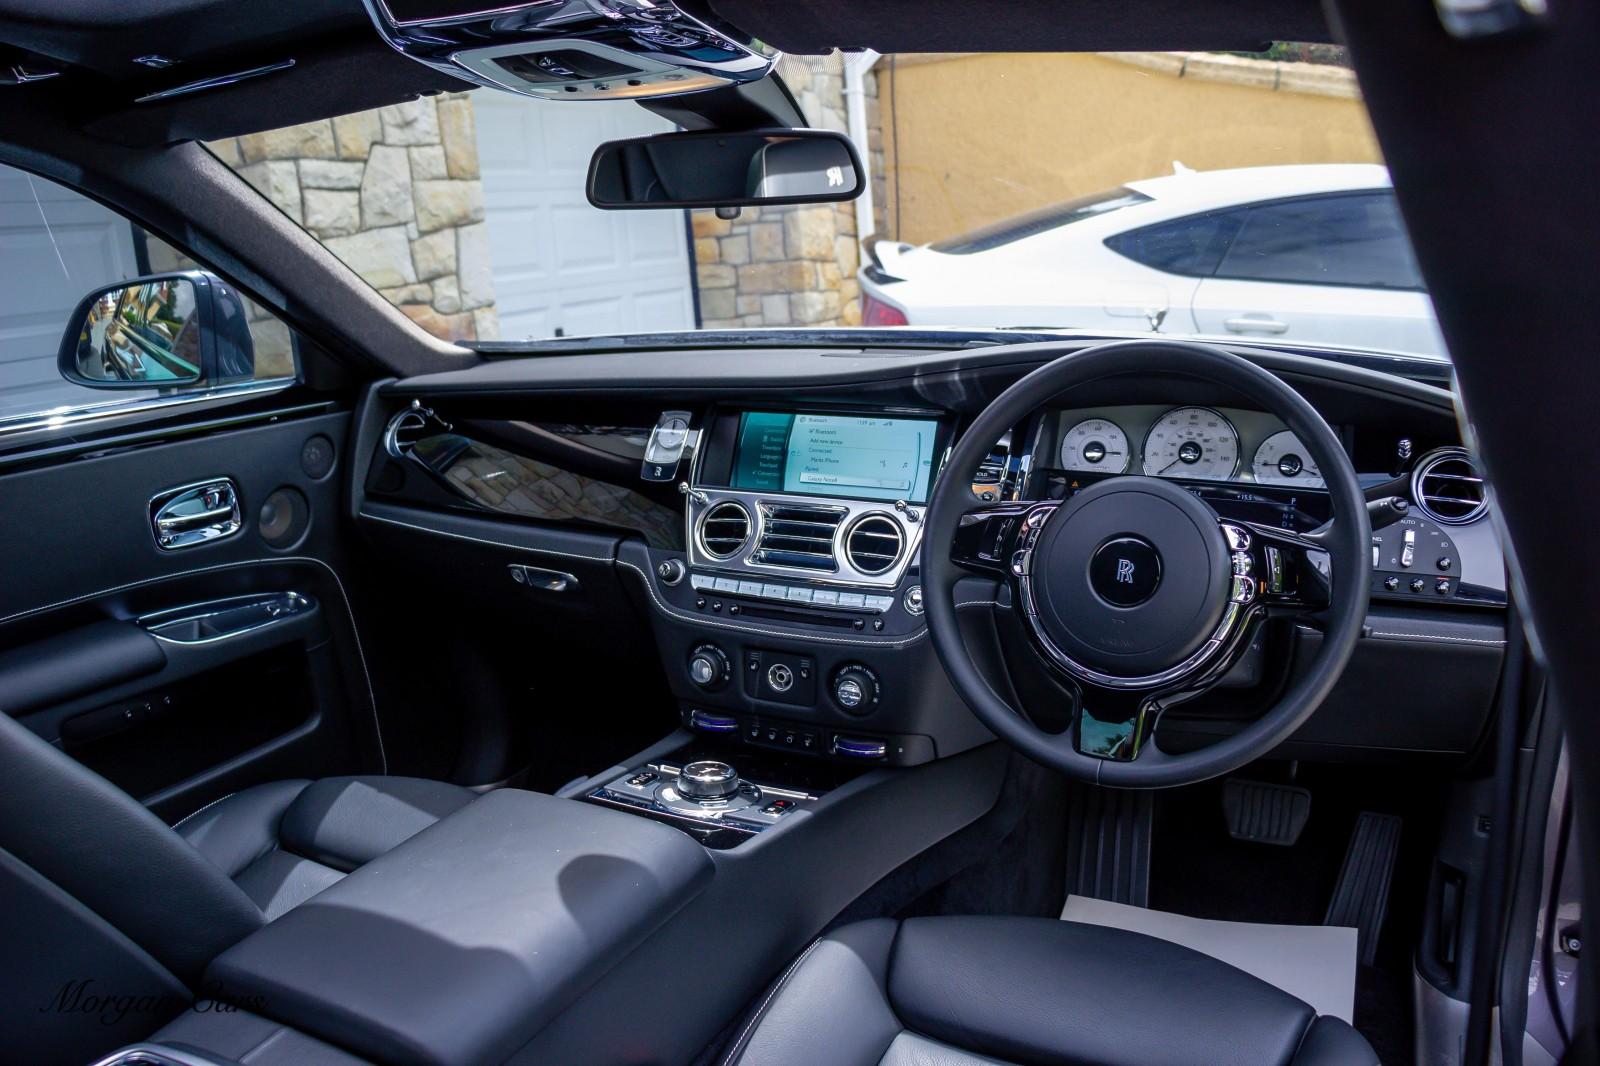 2015 Rolls Royce Ghost V12 SWB SERIES 2 Petrol Automatic – Morgan Cars 9 Mound Road, Warrenpoint, Newry BT34 3LW, UK full